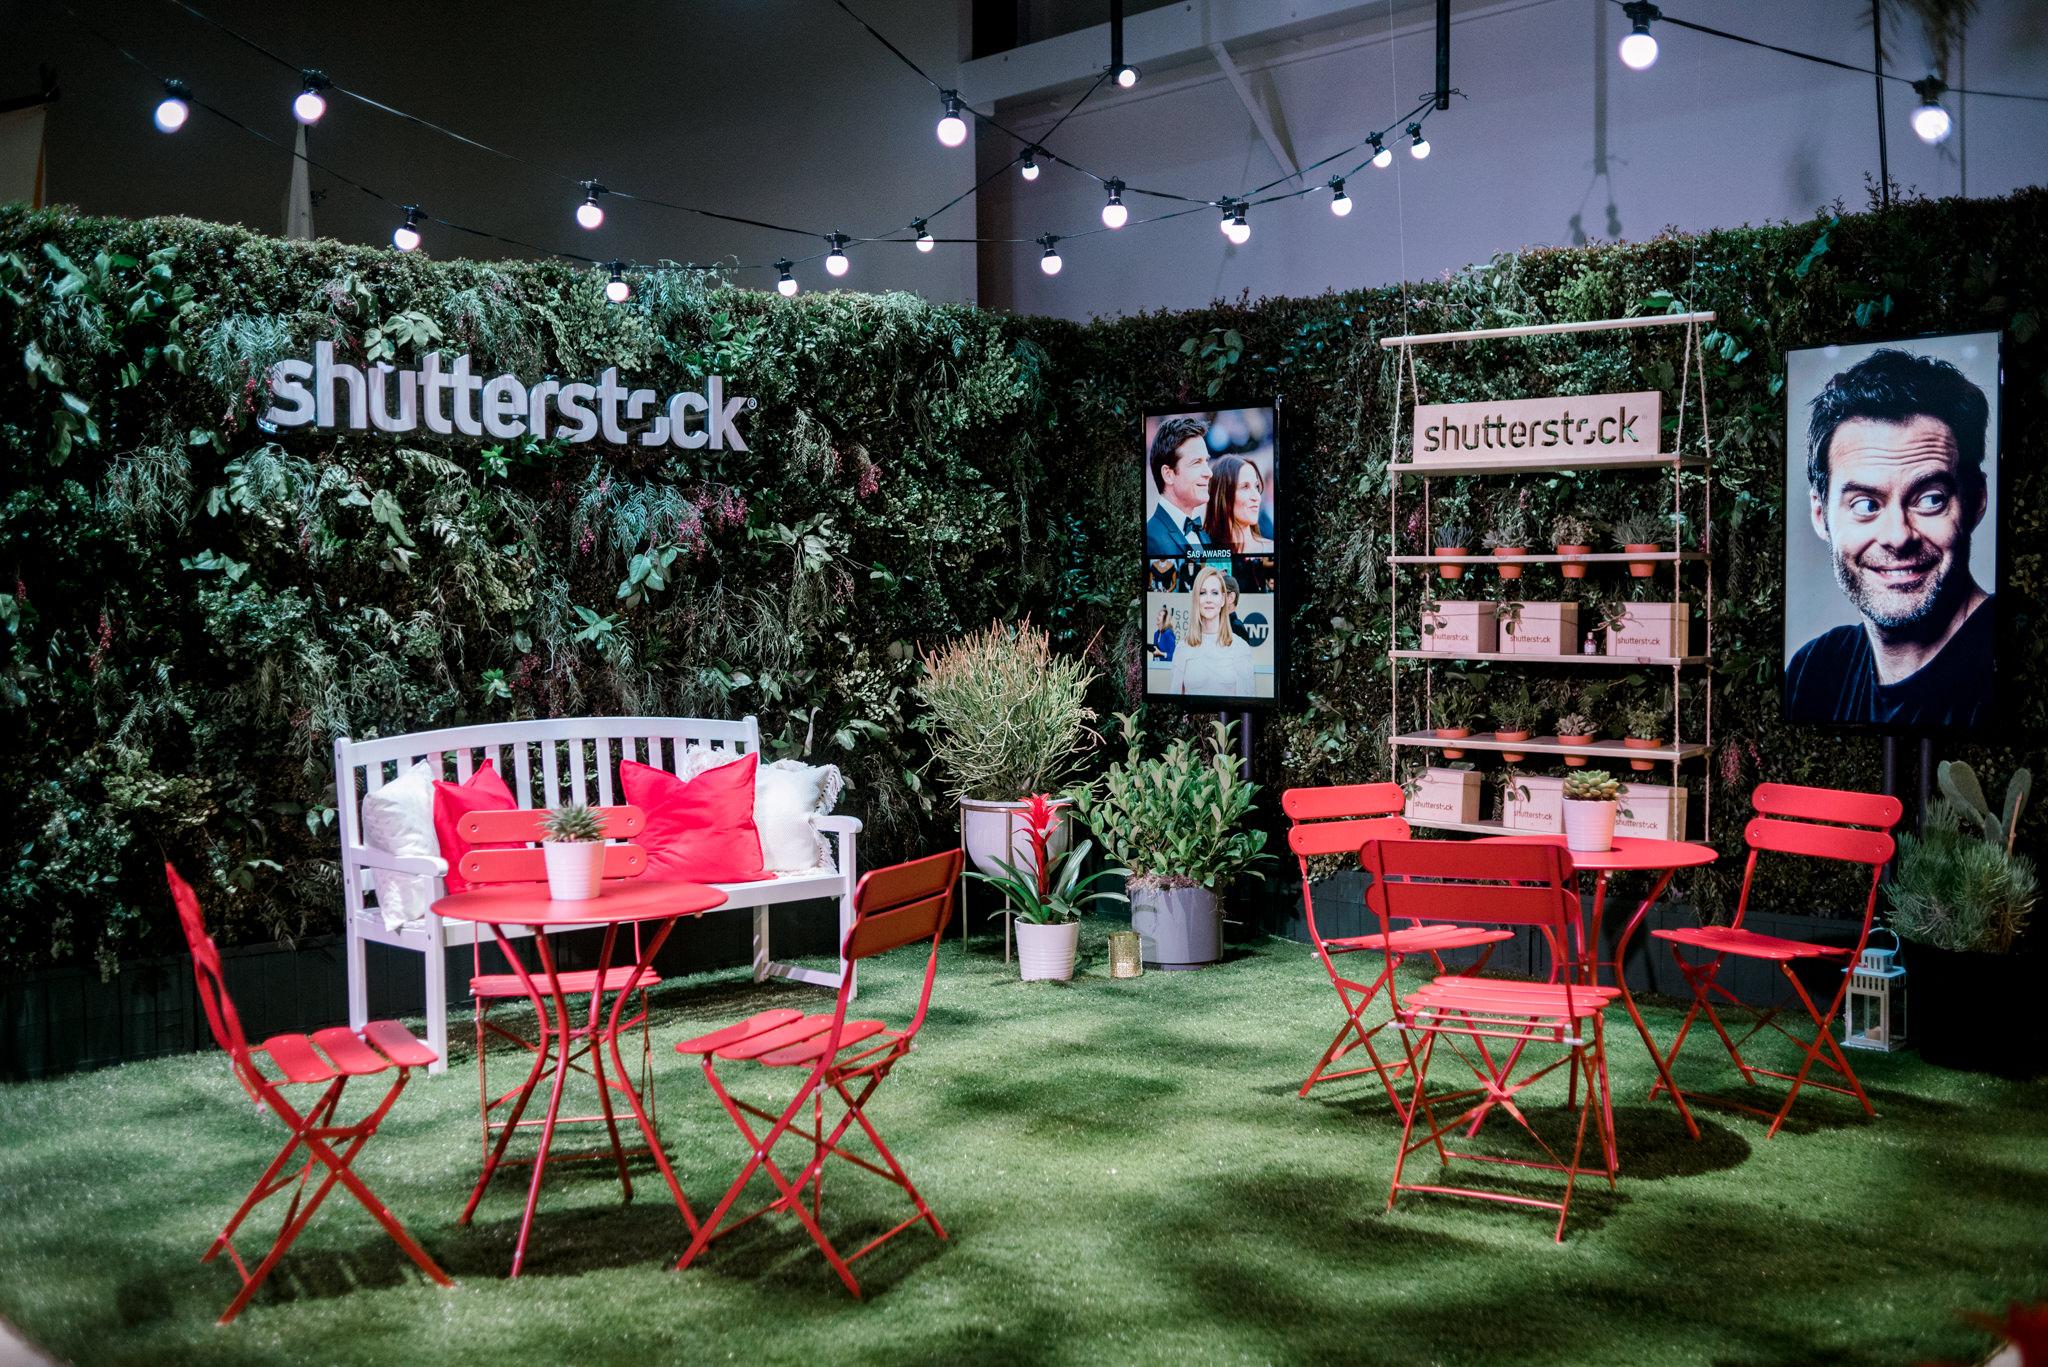 Shutterstock // Sponsorship Activation